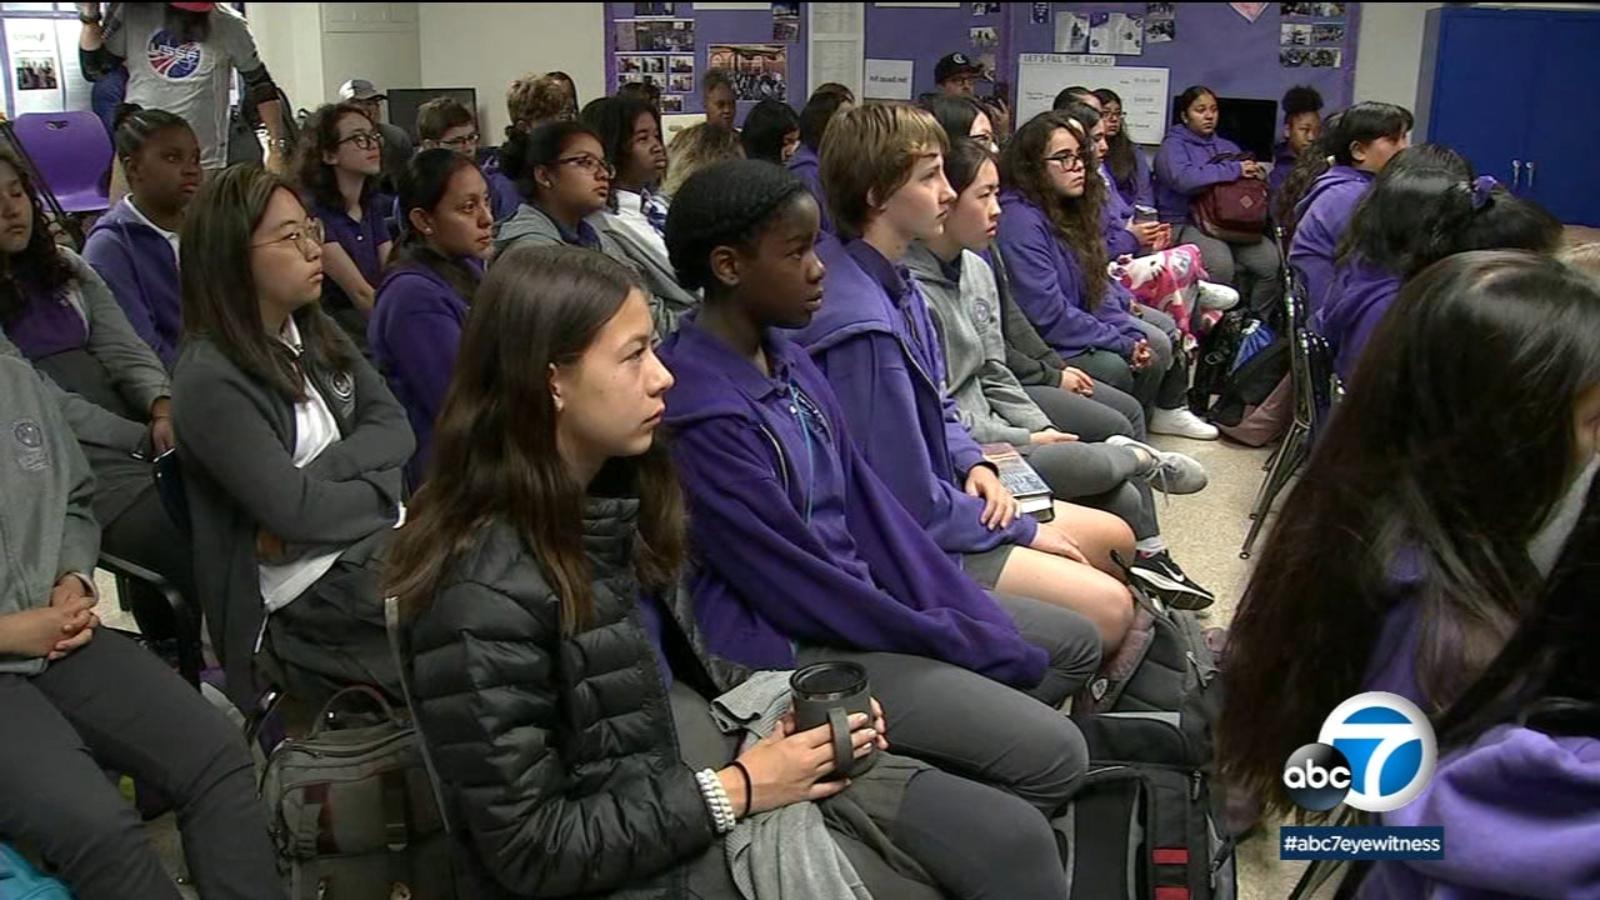 Students at Mid Wilshire girls school watch inspiring all-female spacewalk